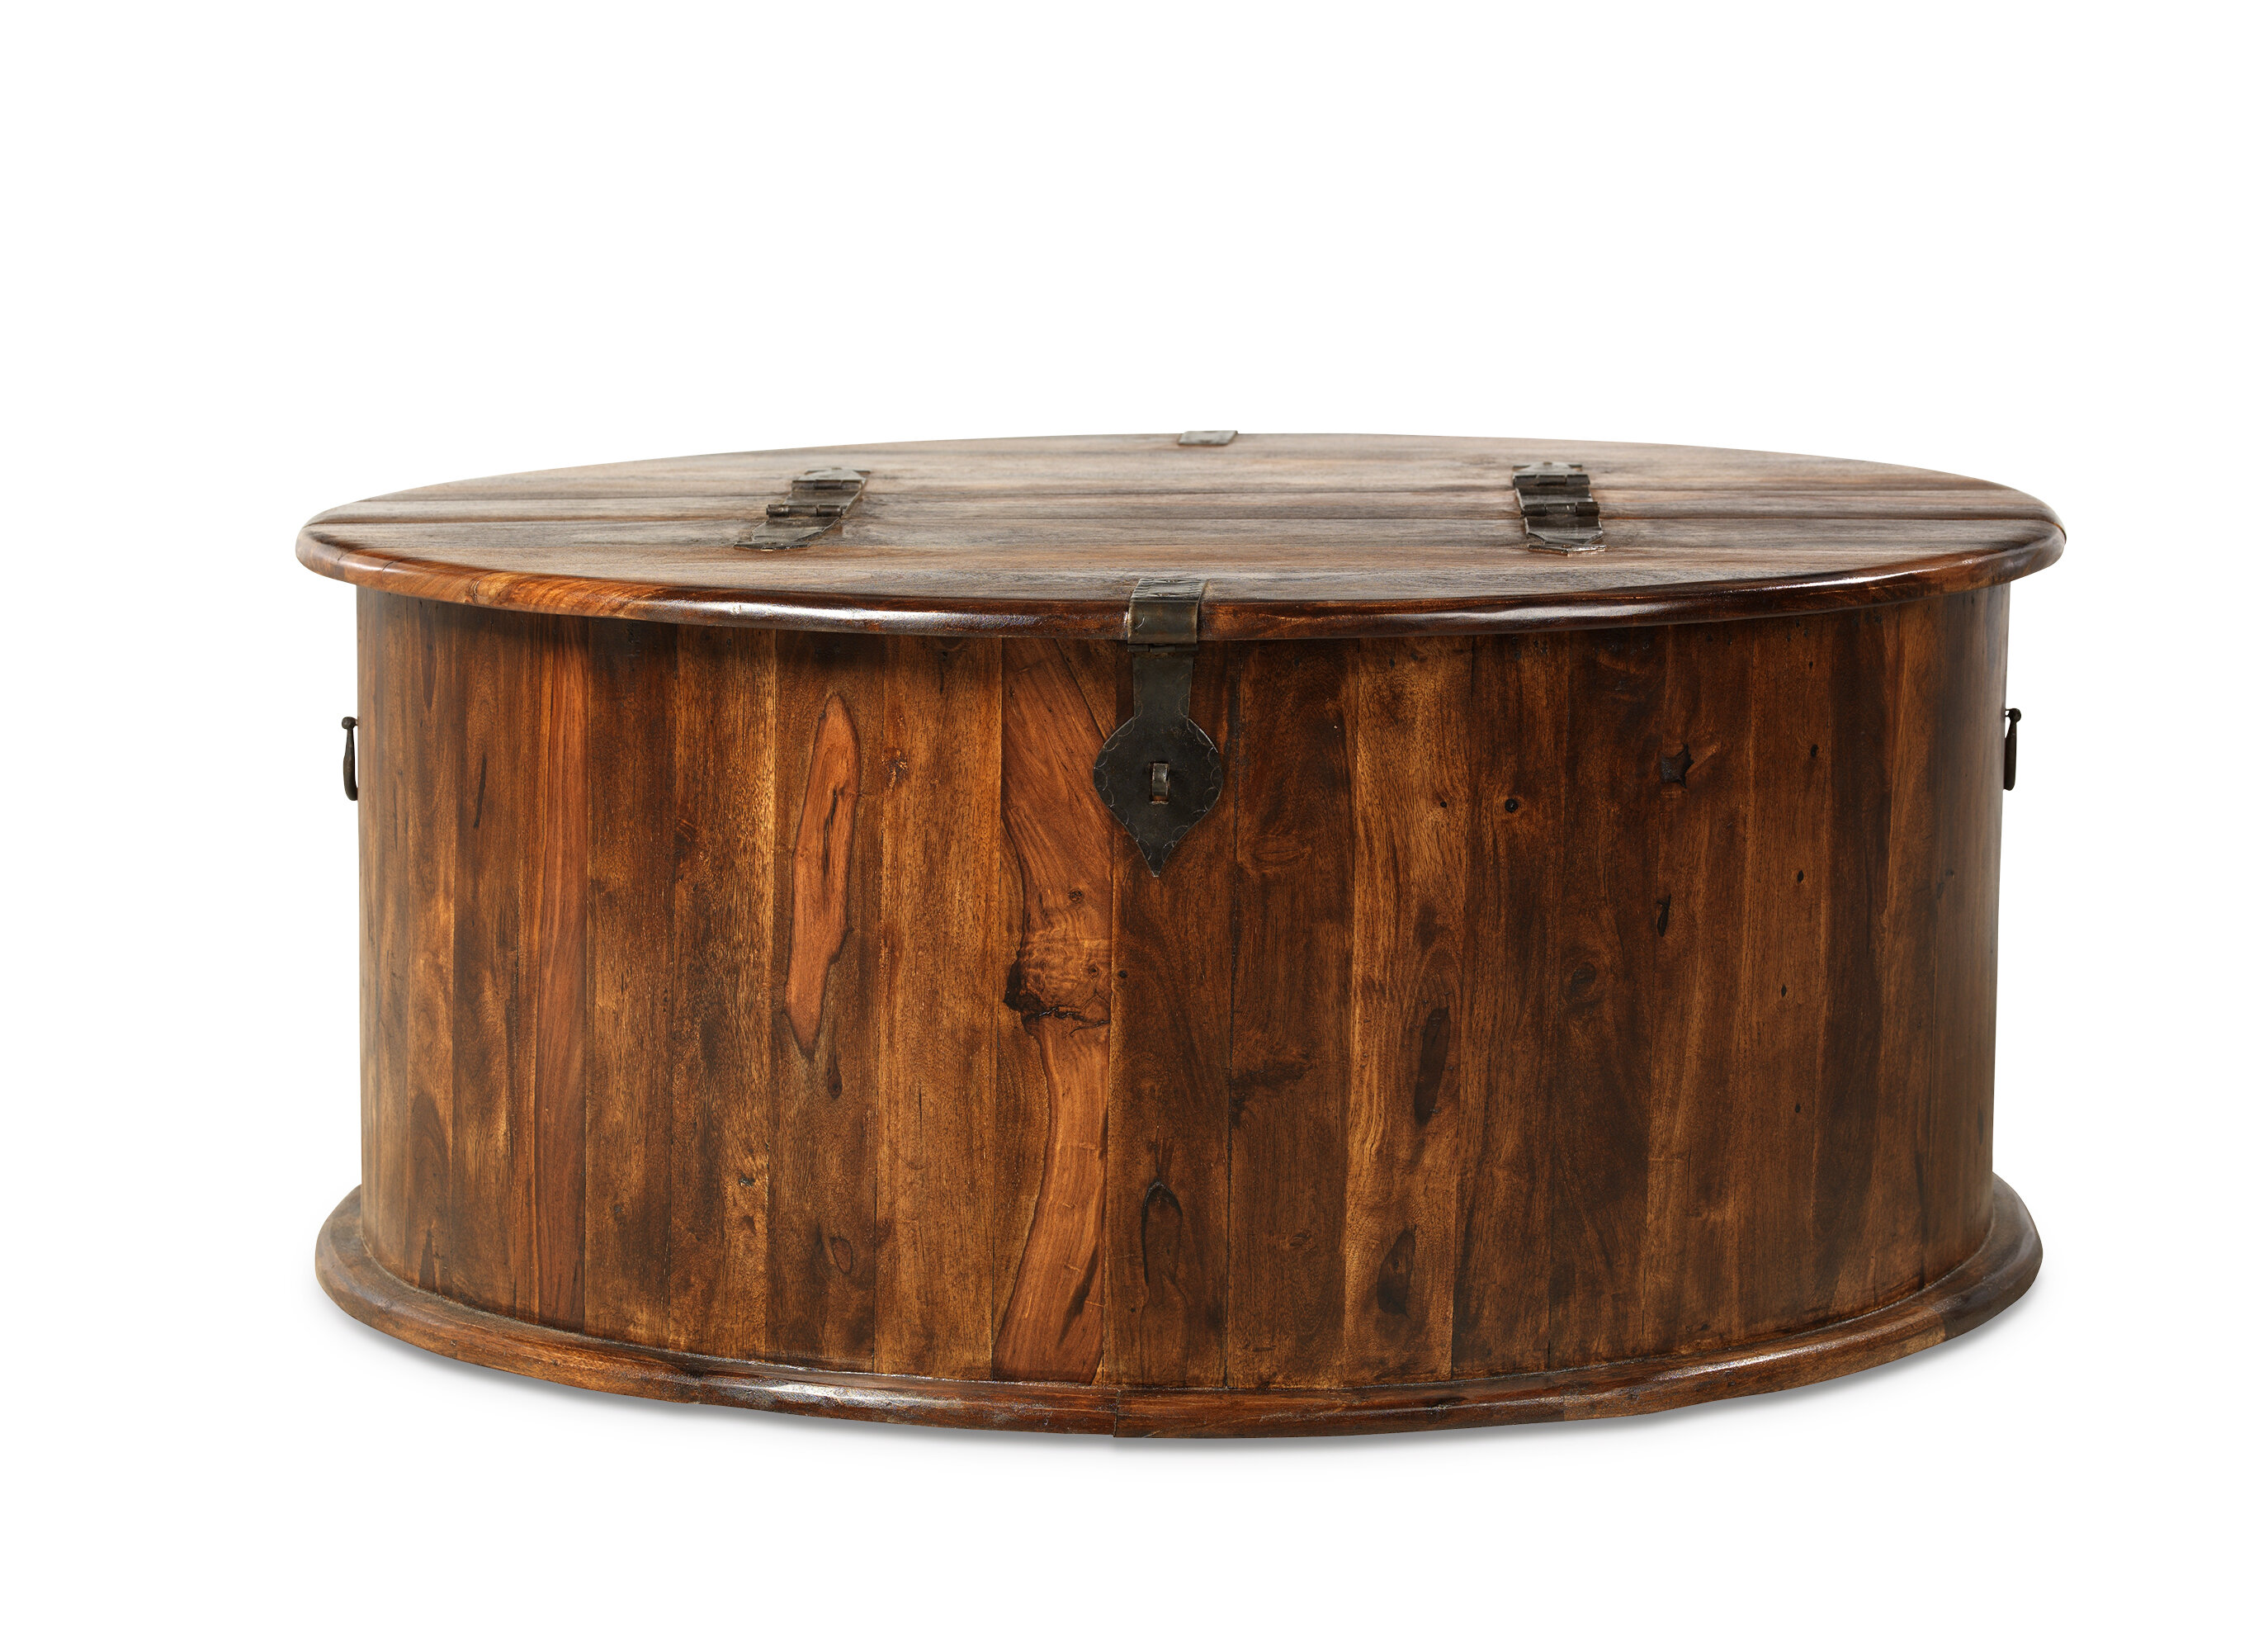 Prestington jali indian coffee table reviews wayfair co uk